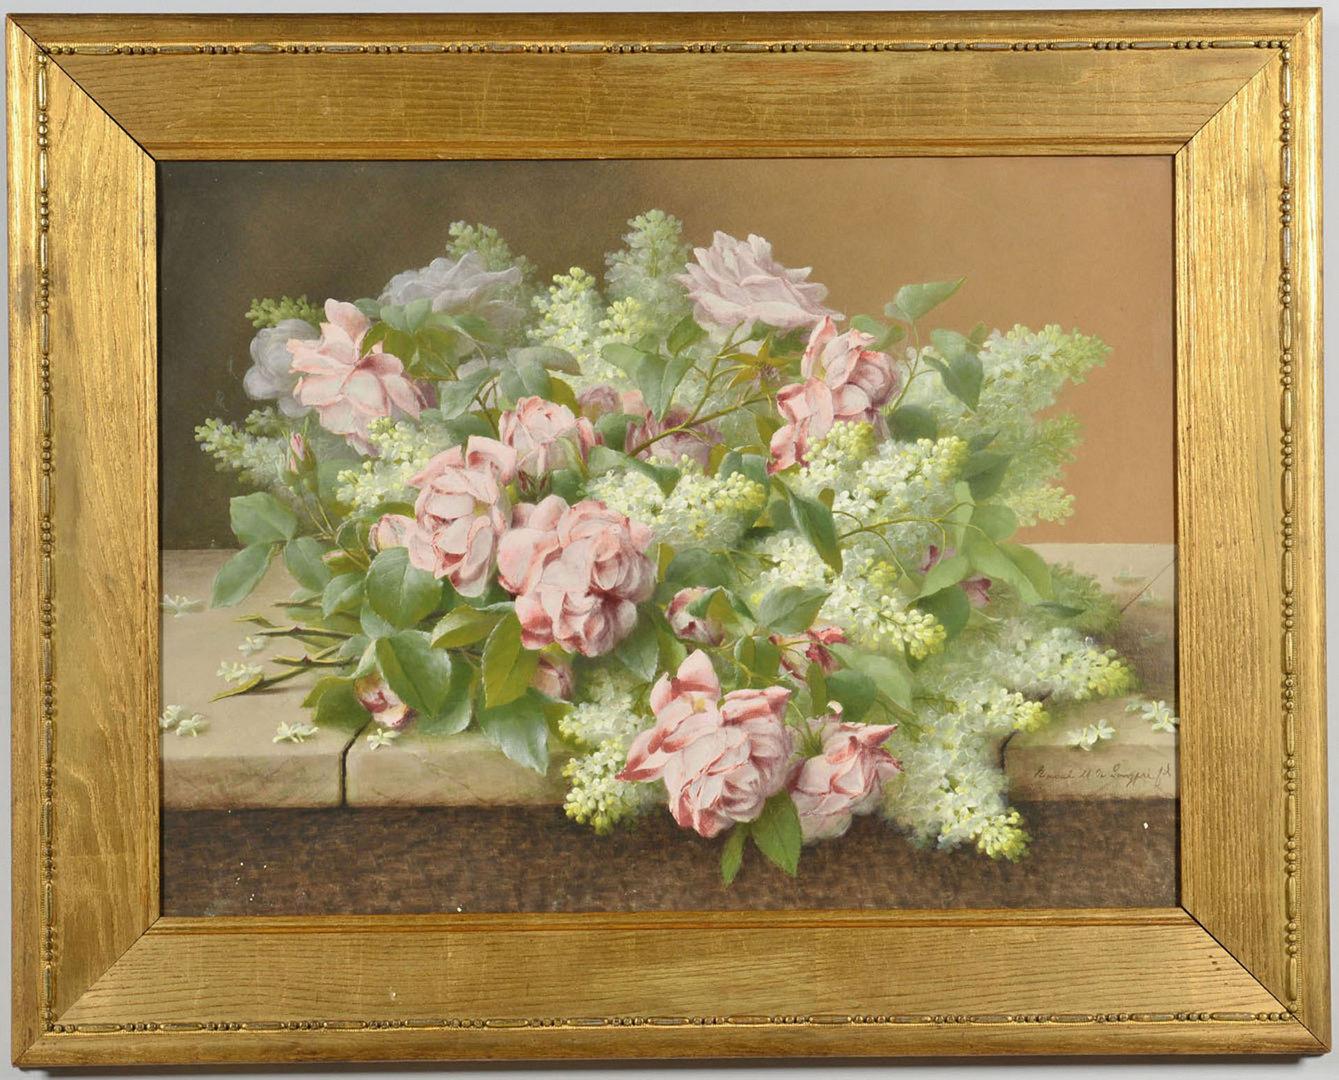 Lot 183: Raoul De Longpre Floral Still Life Painting